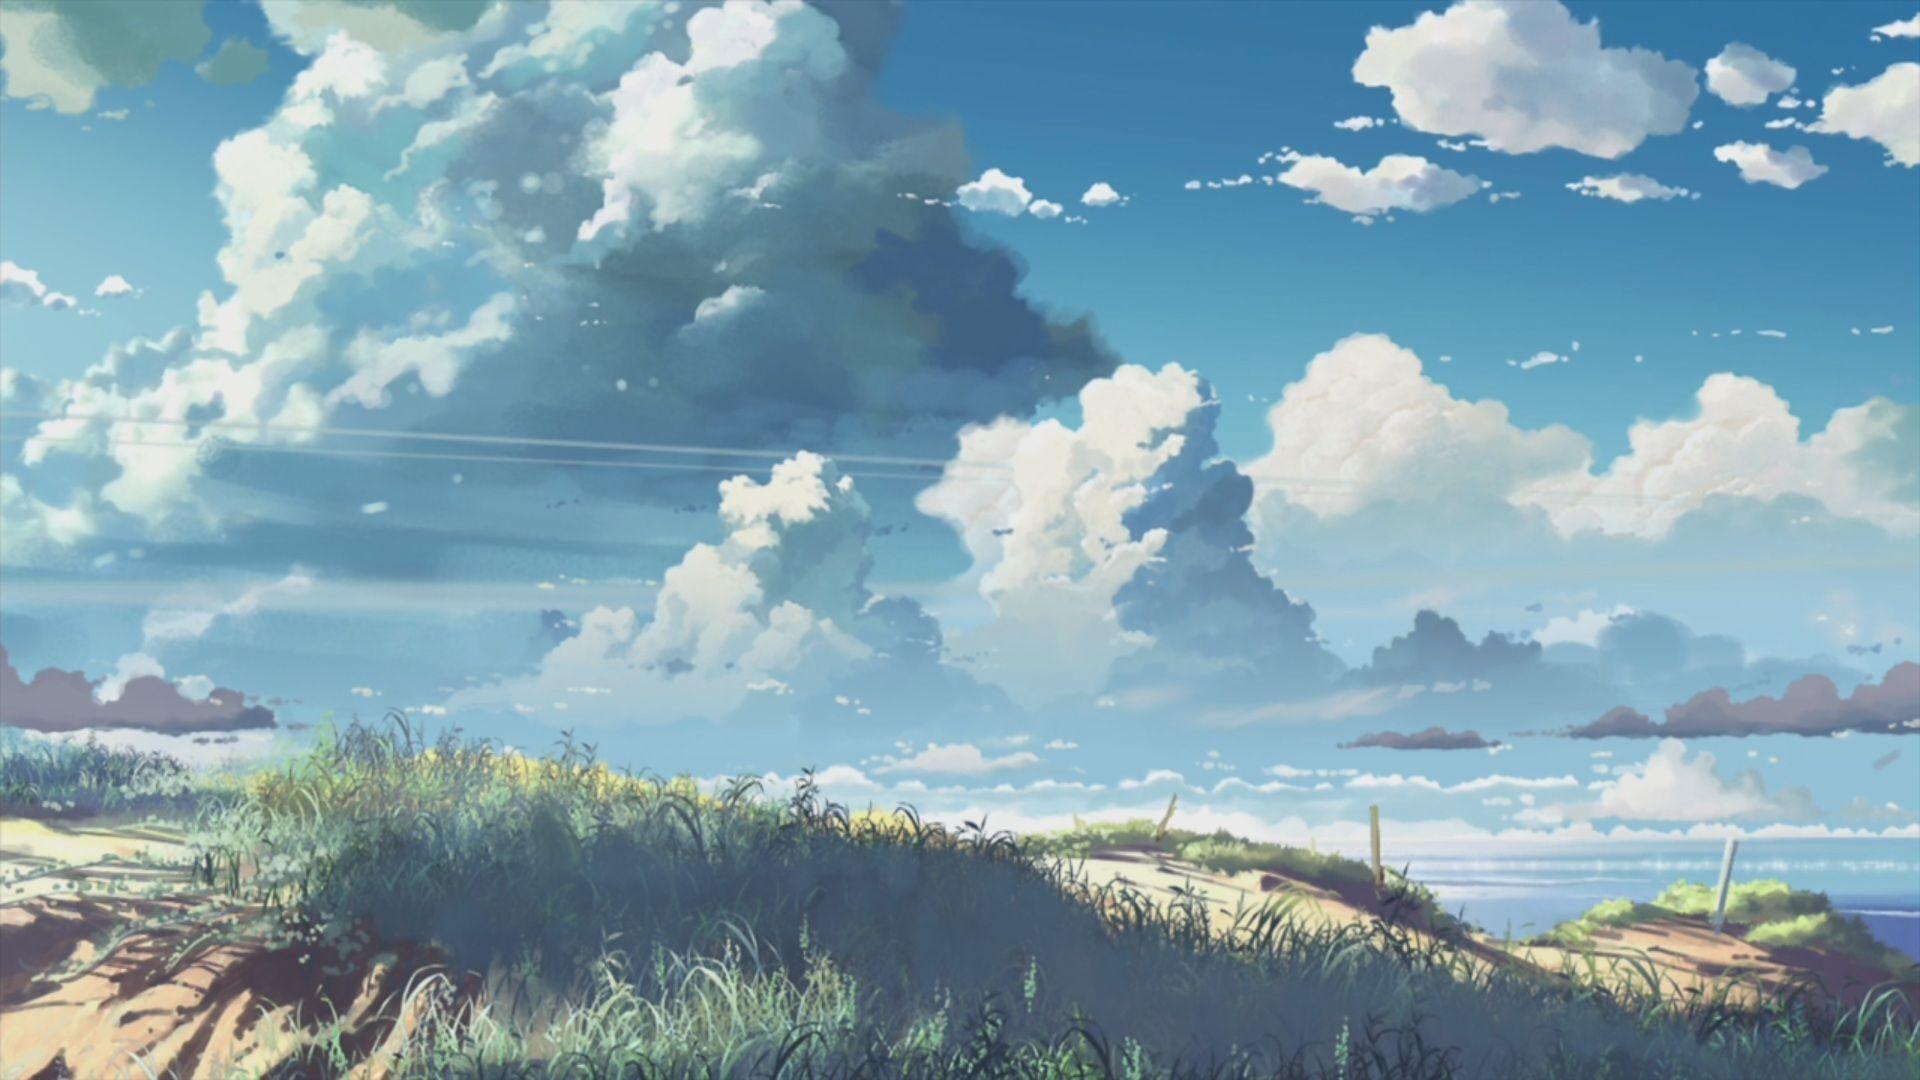 Anime Scenery Anime Scenery Wallpapers Wallpaper Cave - Anime Scenery - HD Wallpaper